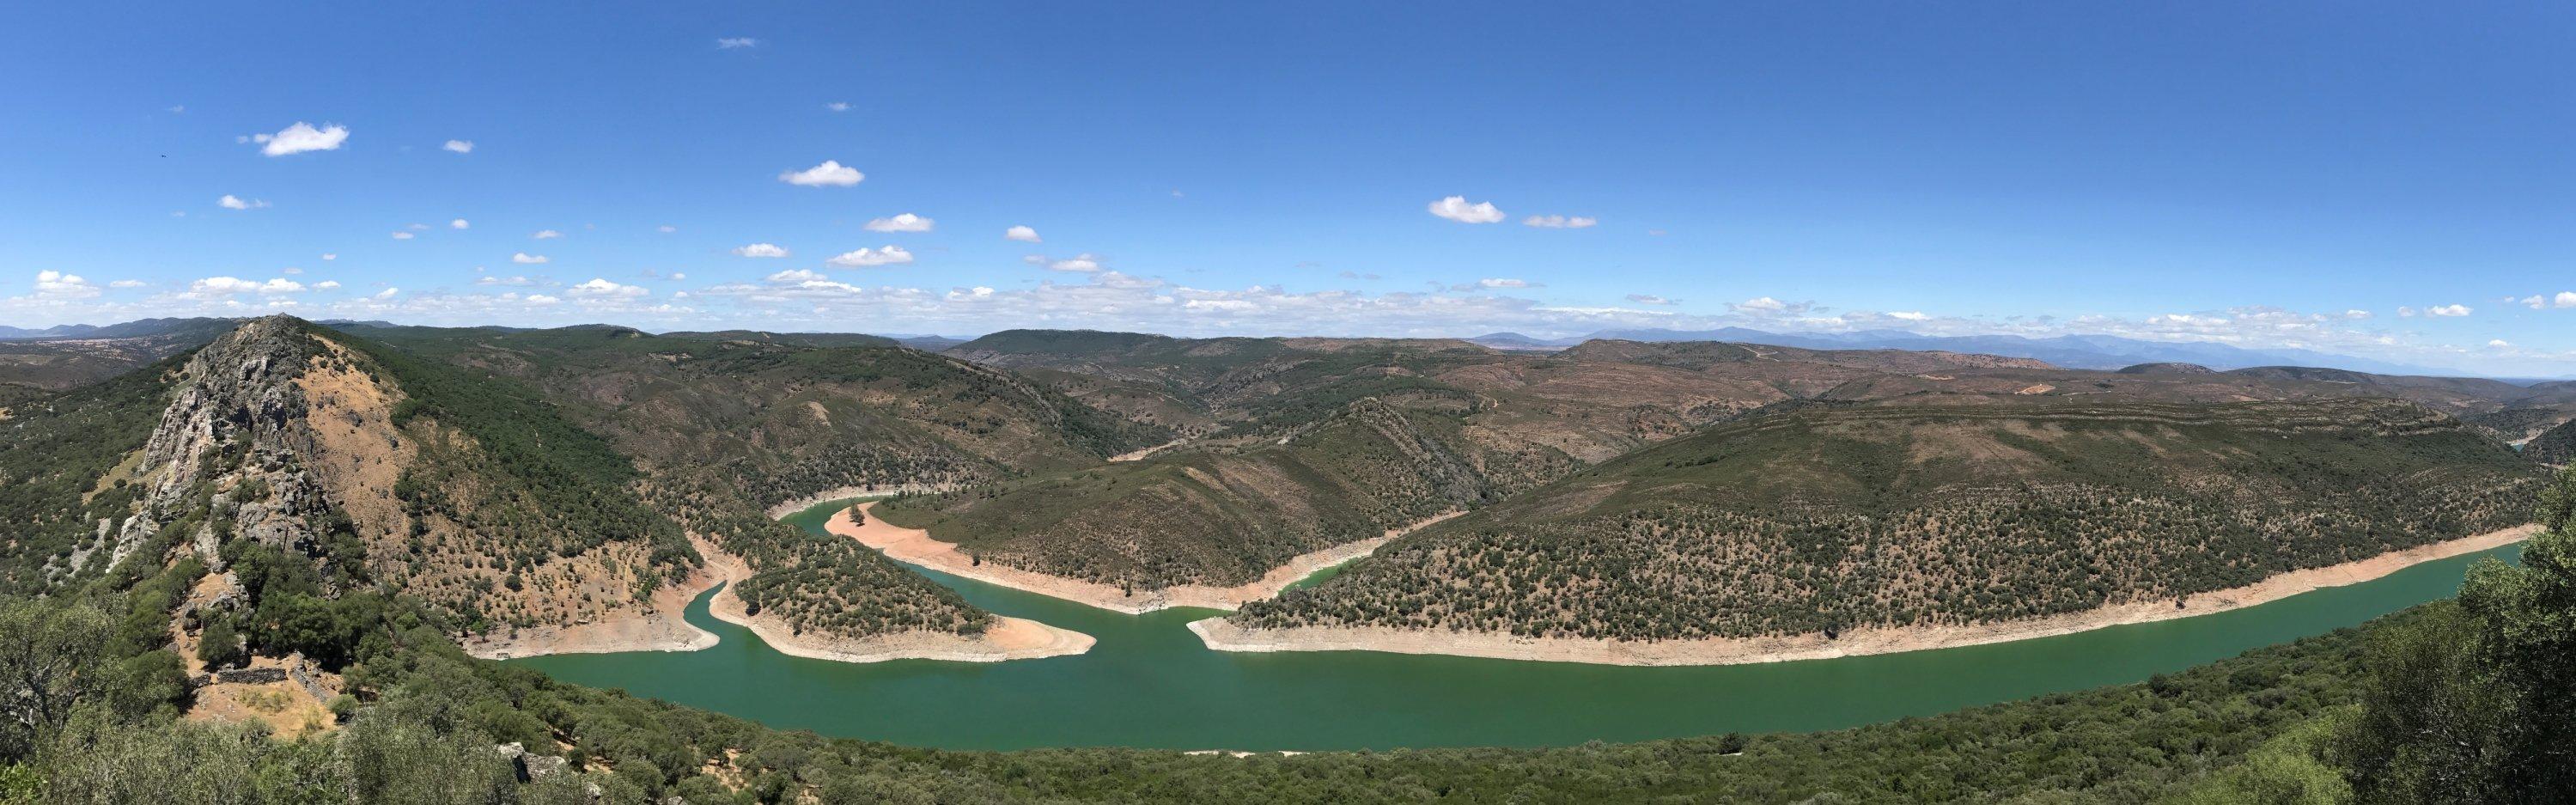 Monfrague NP, Extremadura - LS